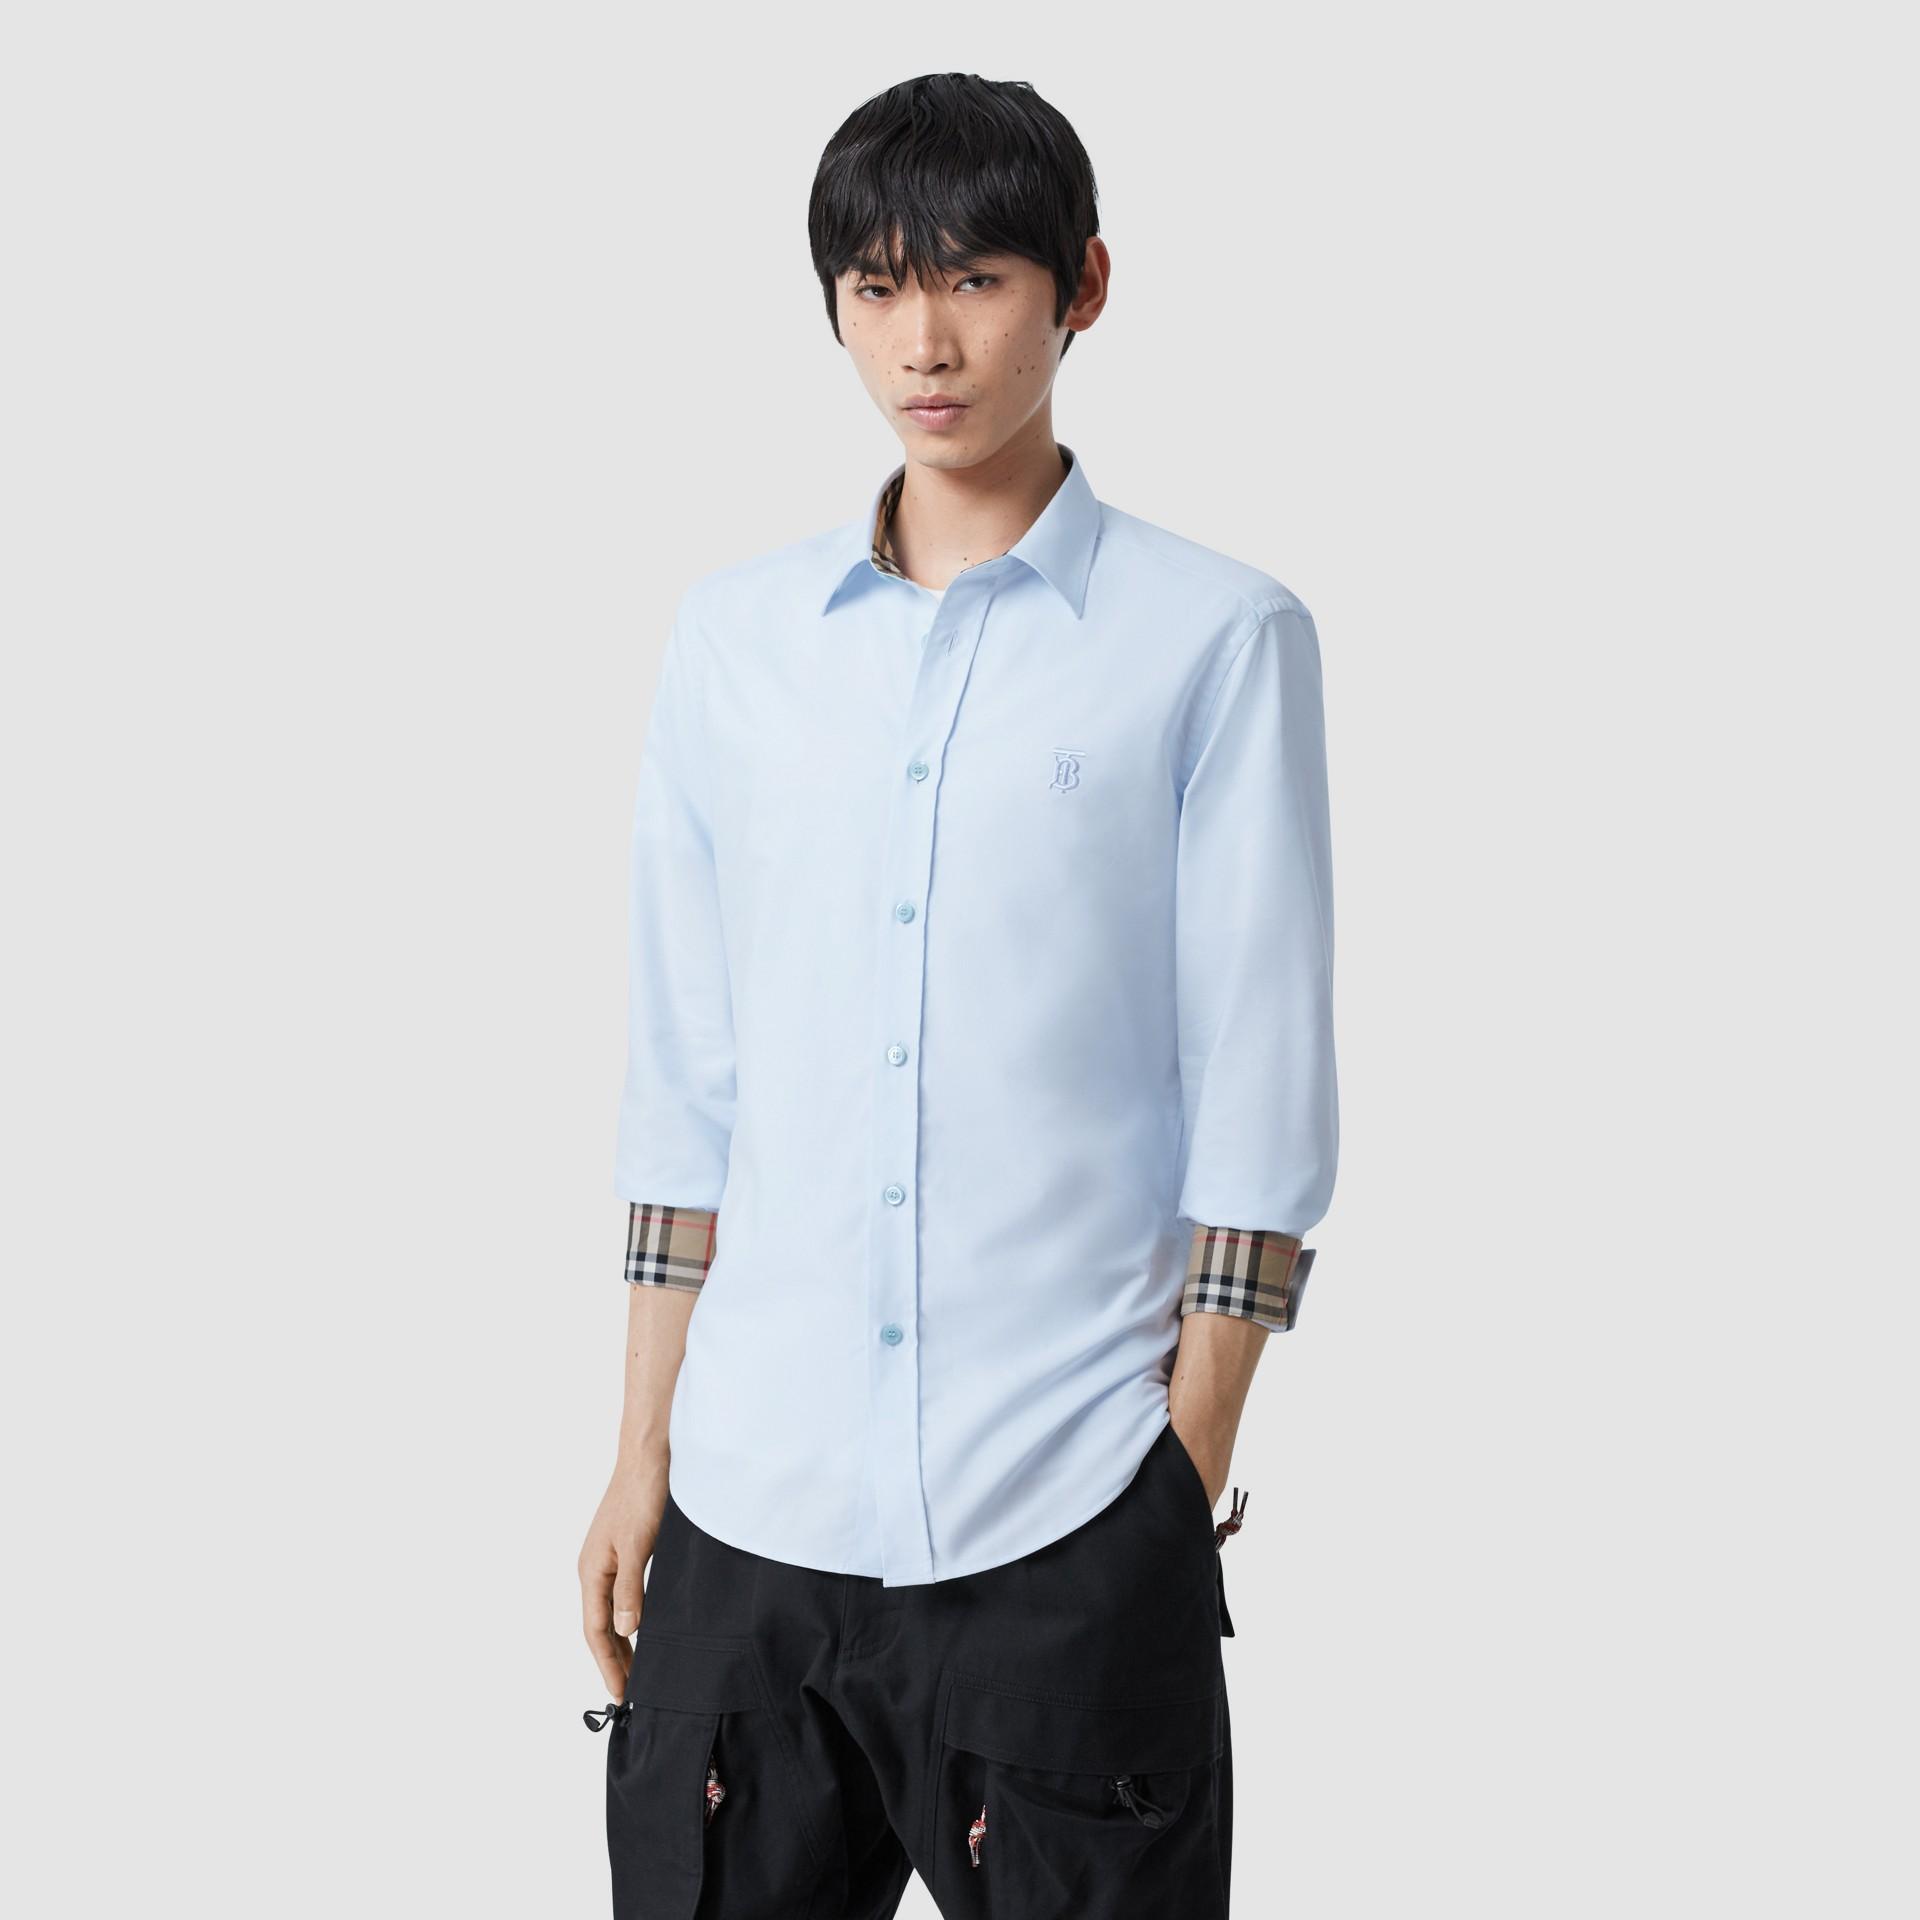 Monogram Motif Cotton Oxford Shirt in White - Men | Burberry - gallery image 5